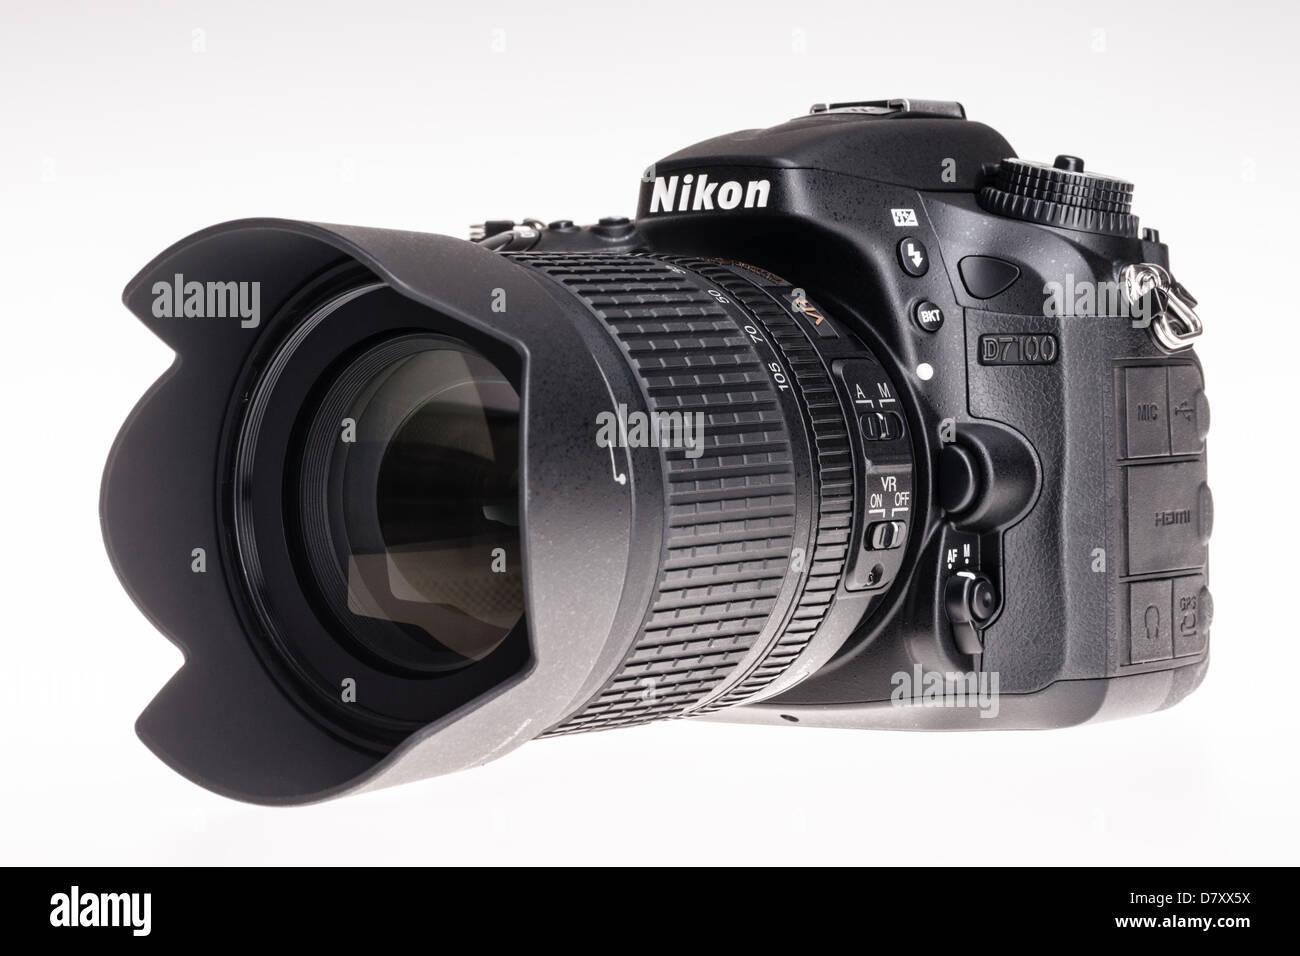 Nikon D7100 digital SLR - camera with 18-105mm lens. - Stock Image